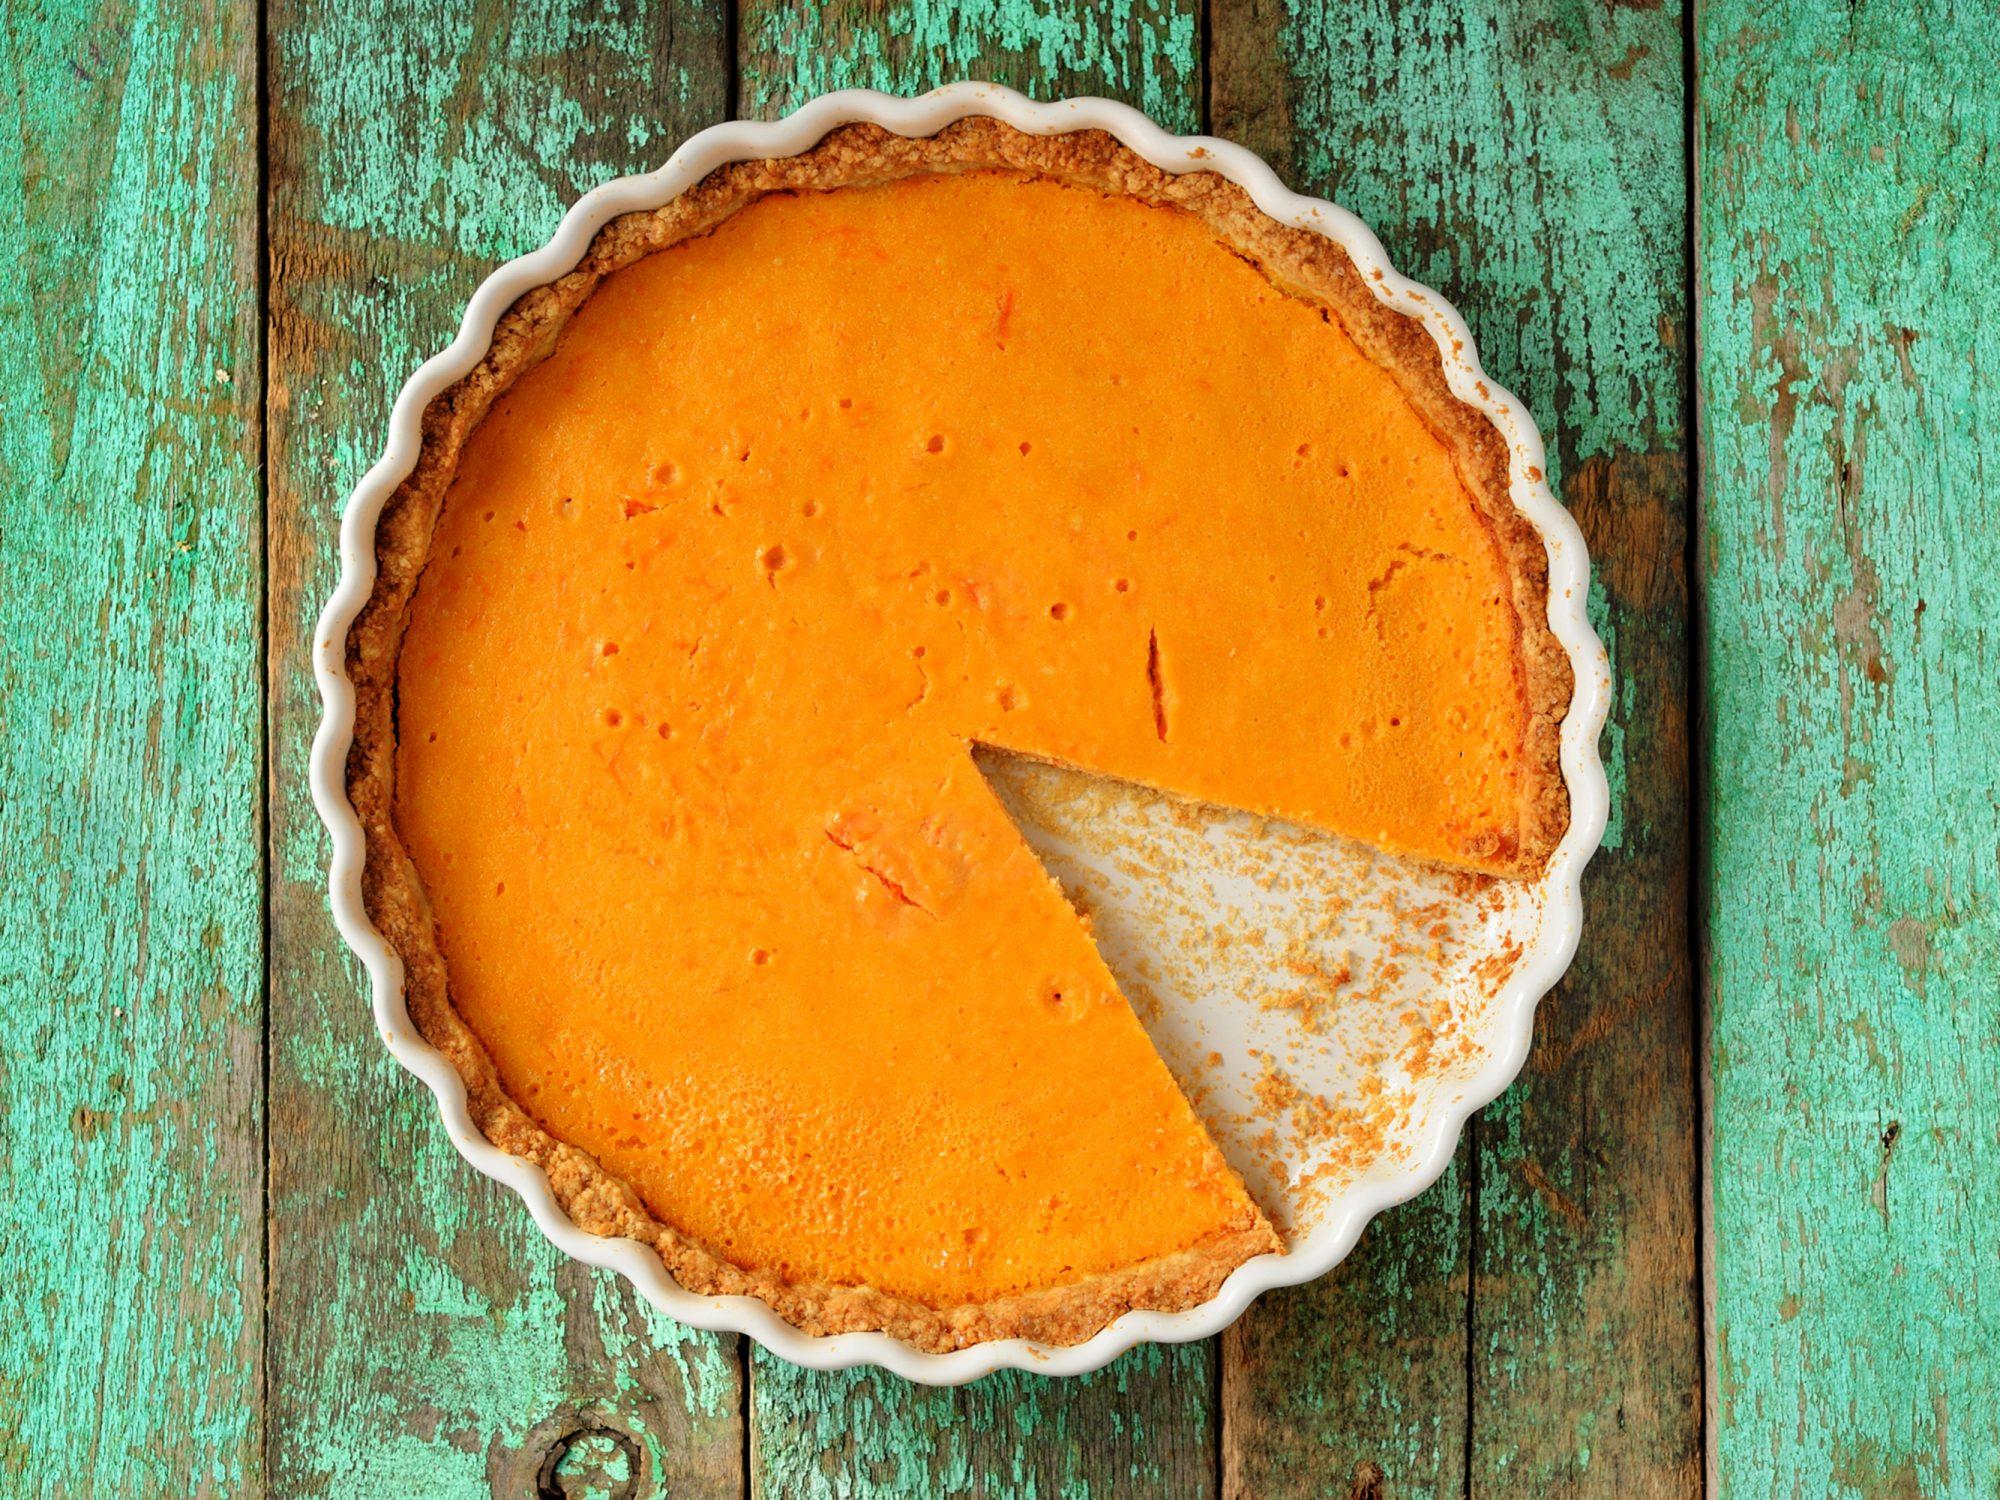 Homemade Pumpkin Pie in White Baking Dish